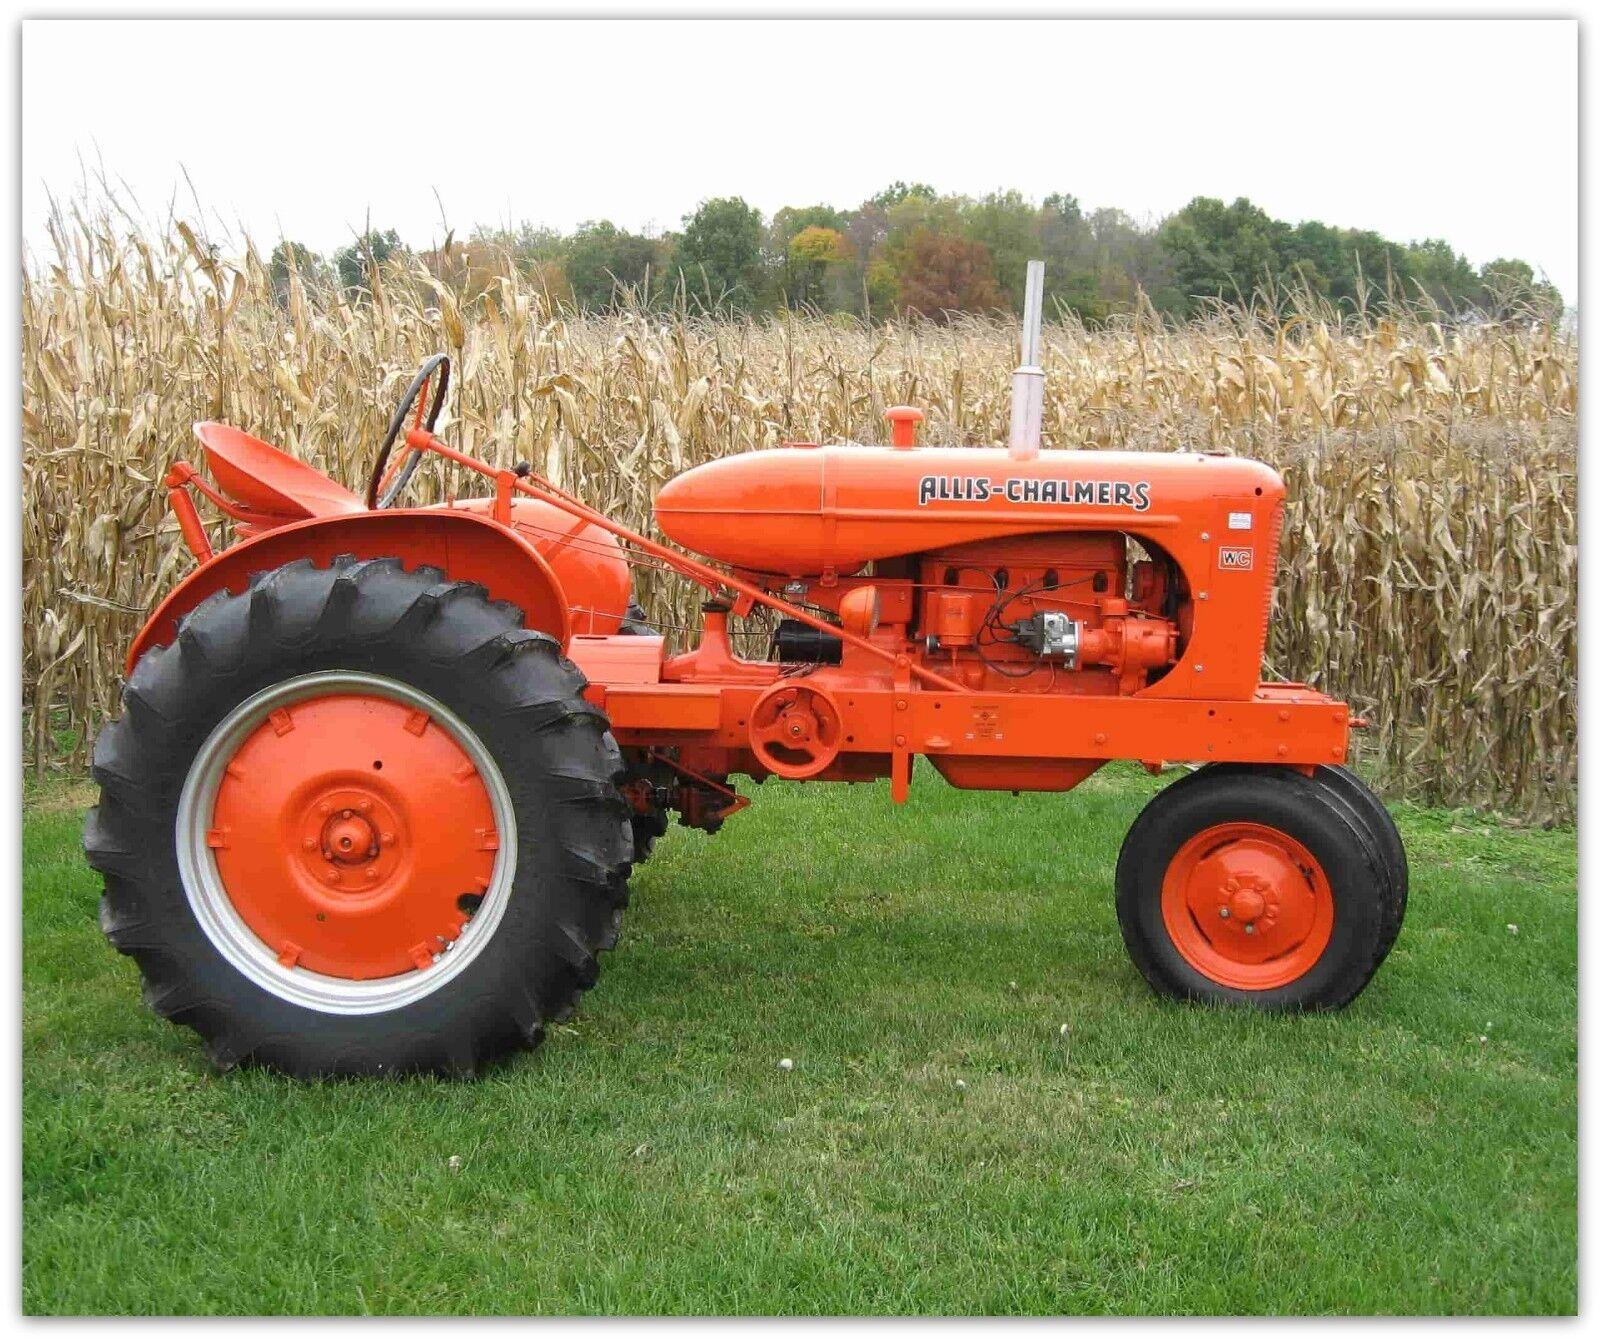 VTG Tractor Allis Chalmers  Fleece Blanket Throw 50x60 bed sofa farmer rancher